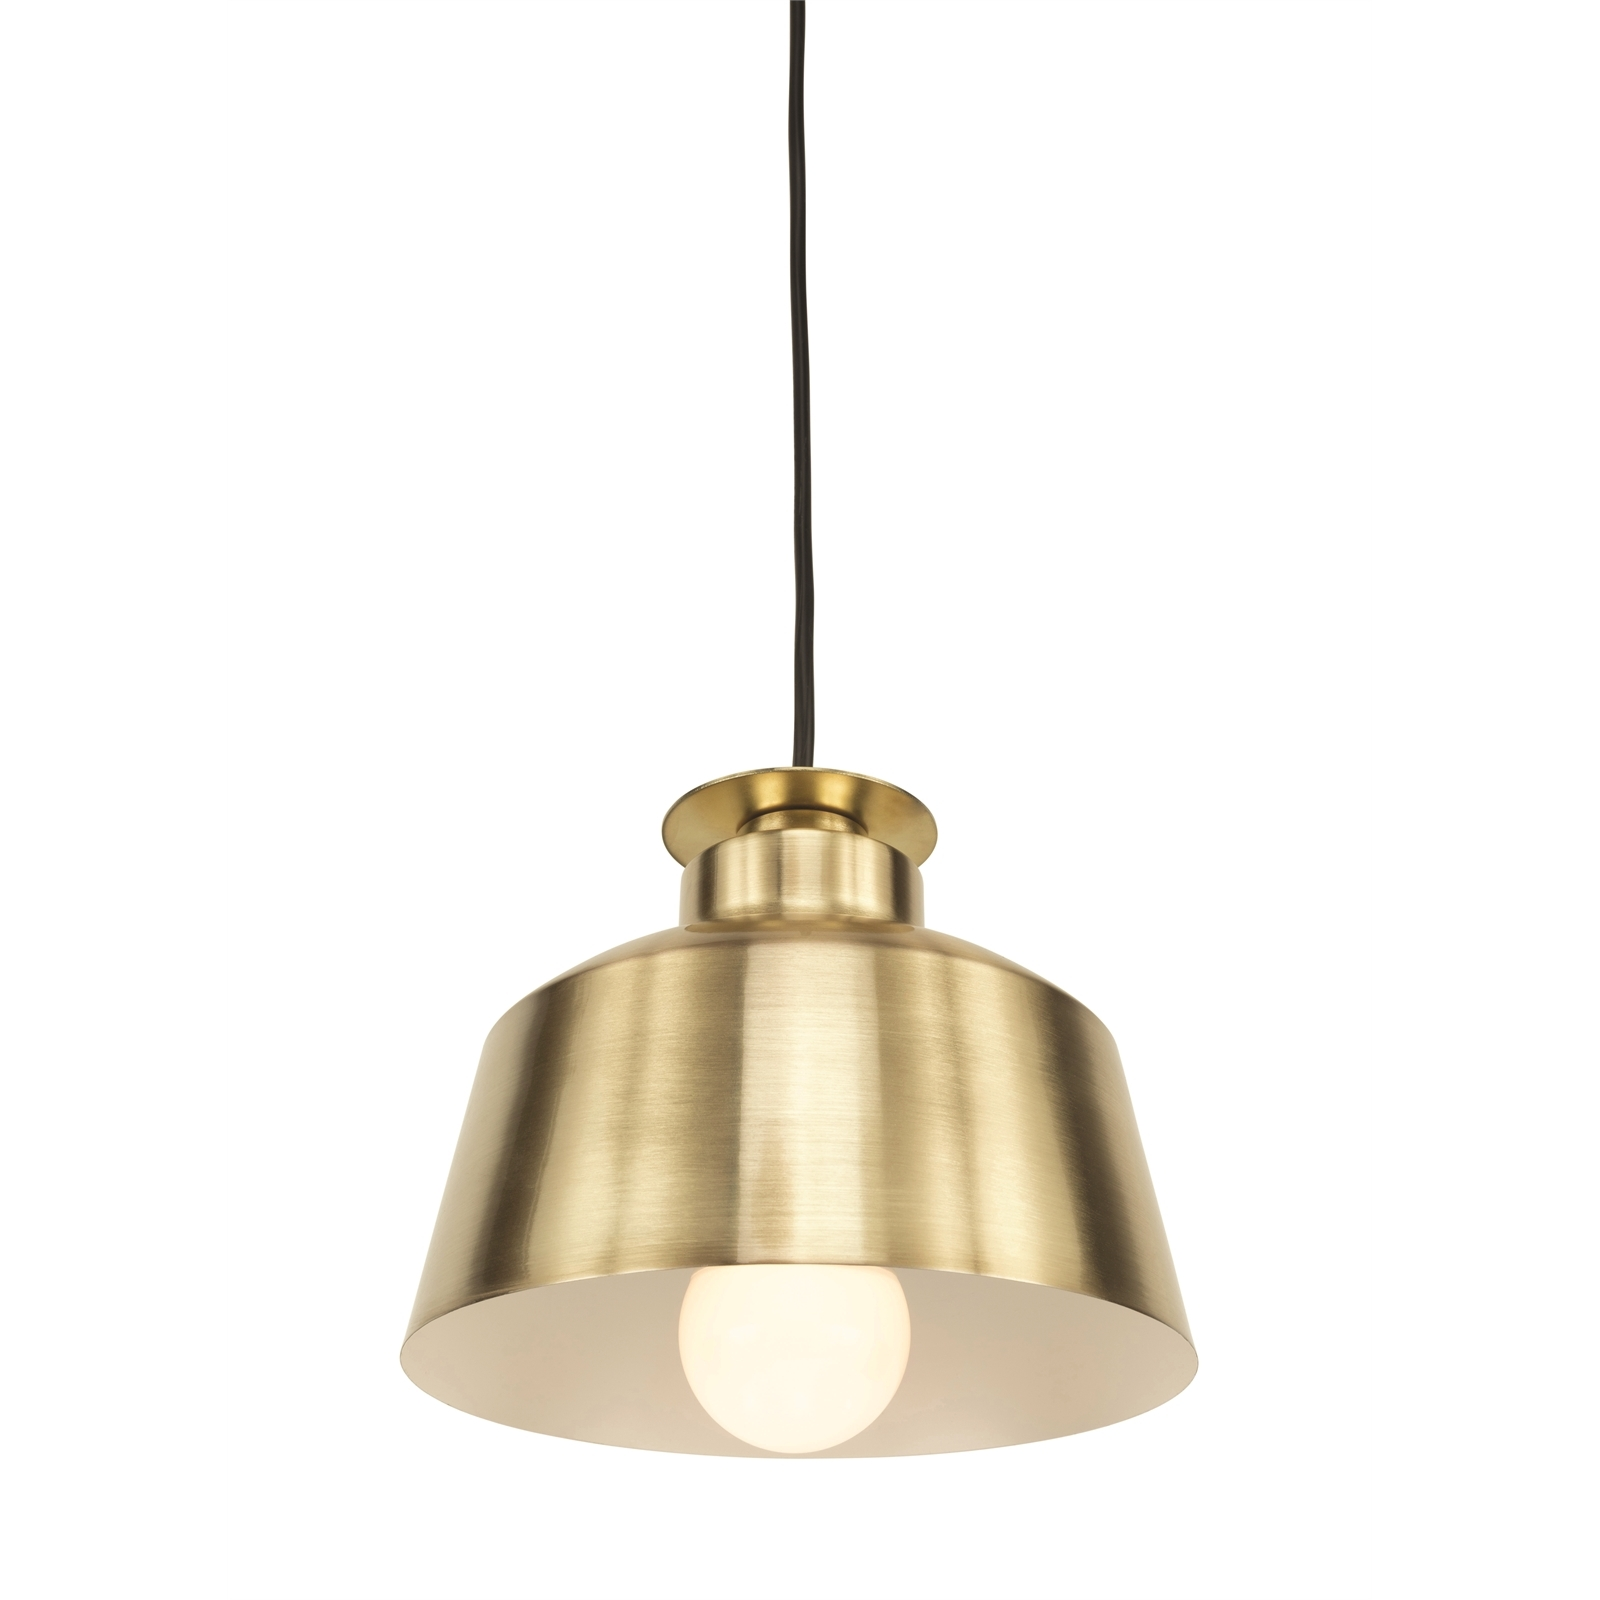 Brilliant 20cm Satin Brass Edie DIY Plug-In Lux Industrial Metal Pendant Light